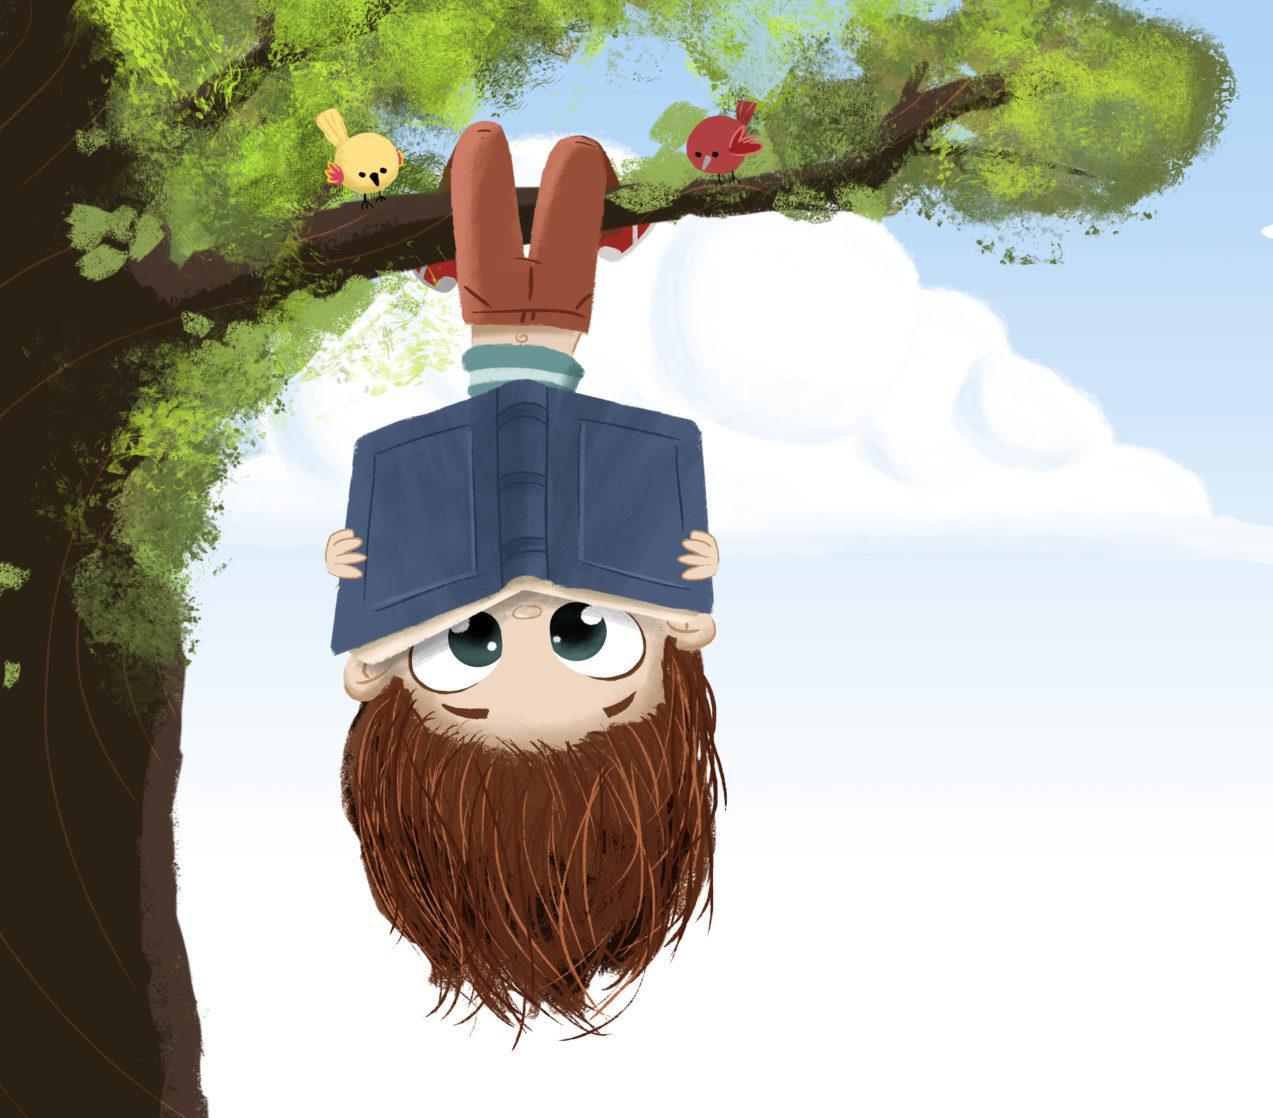 Kind mit Buch Illustration